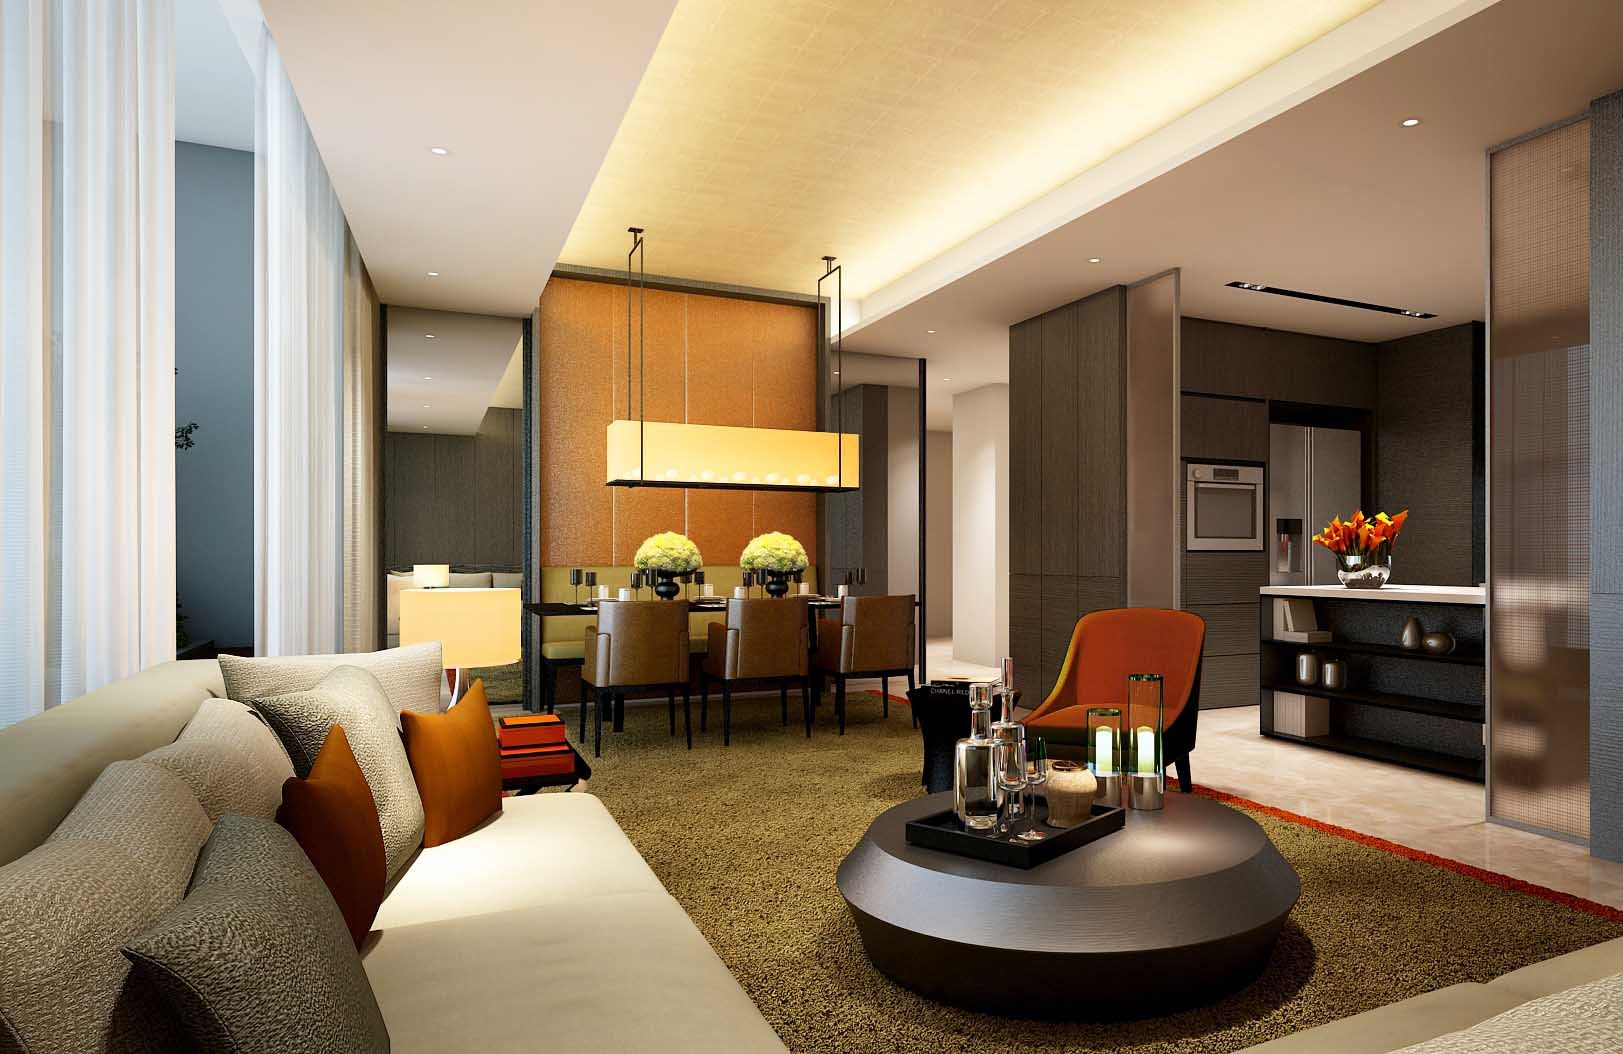 SCDA GCMN Apartments, Jakarta, Indonesia | Interior design ...